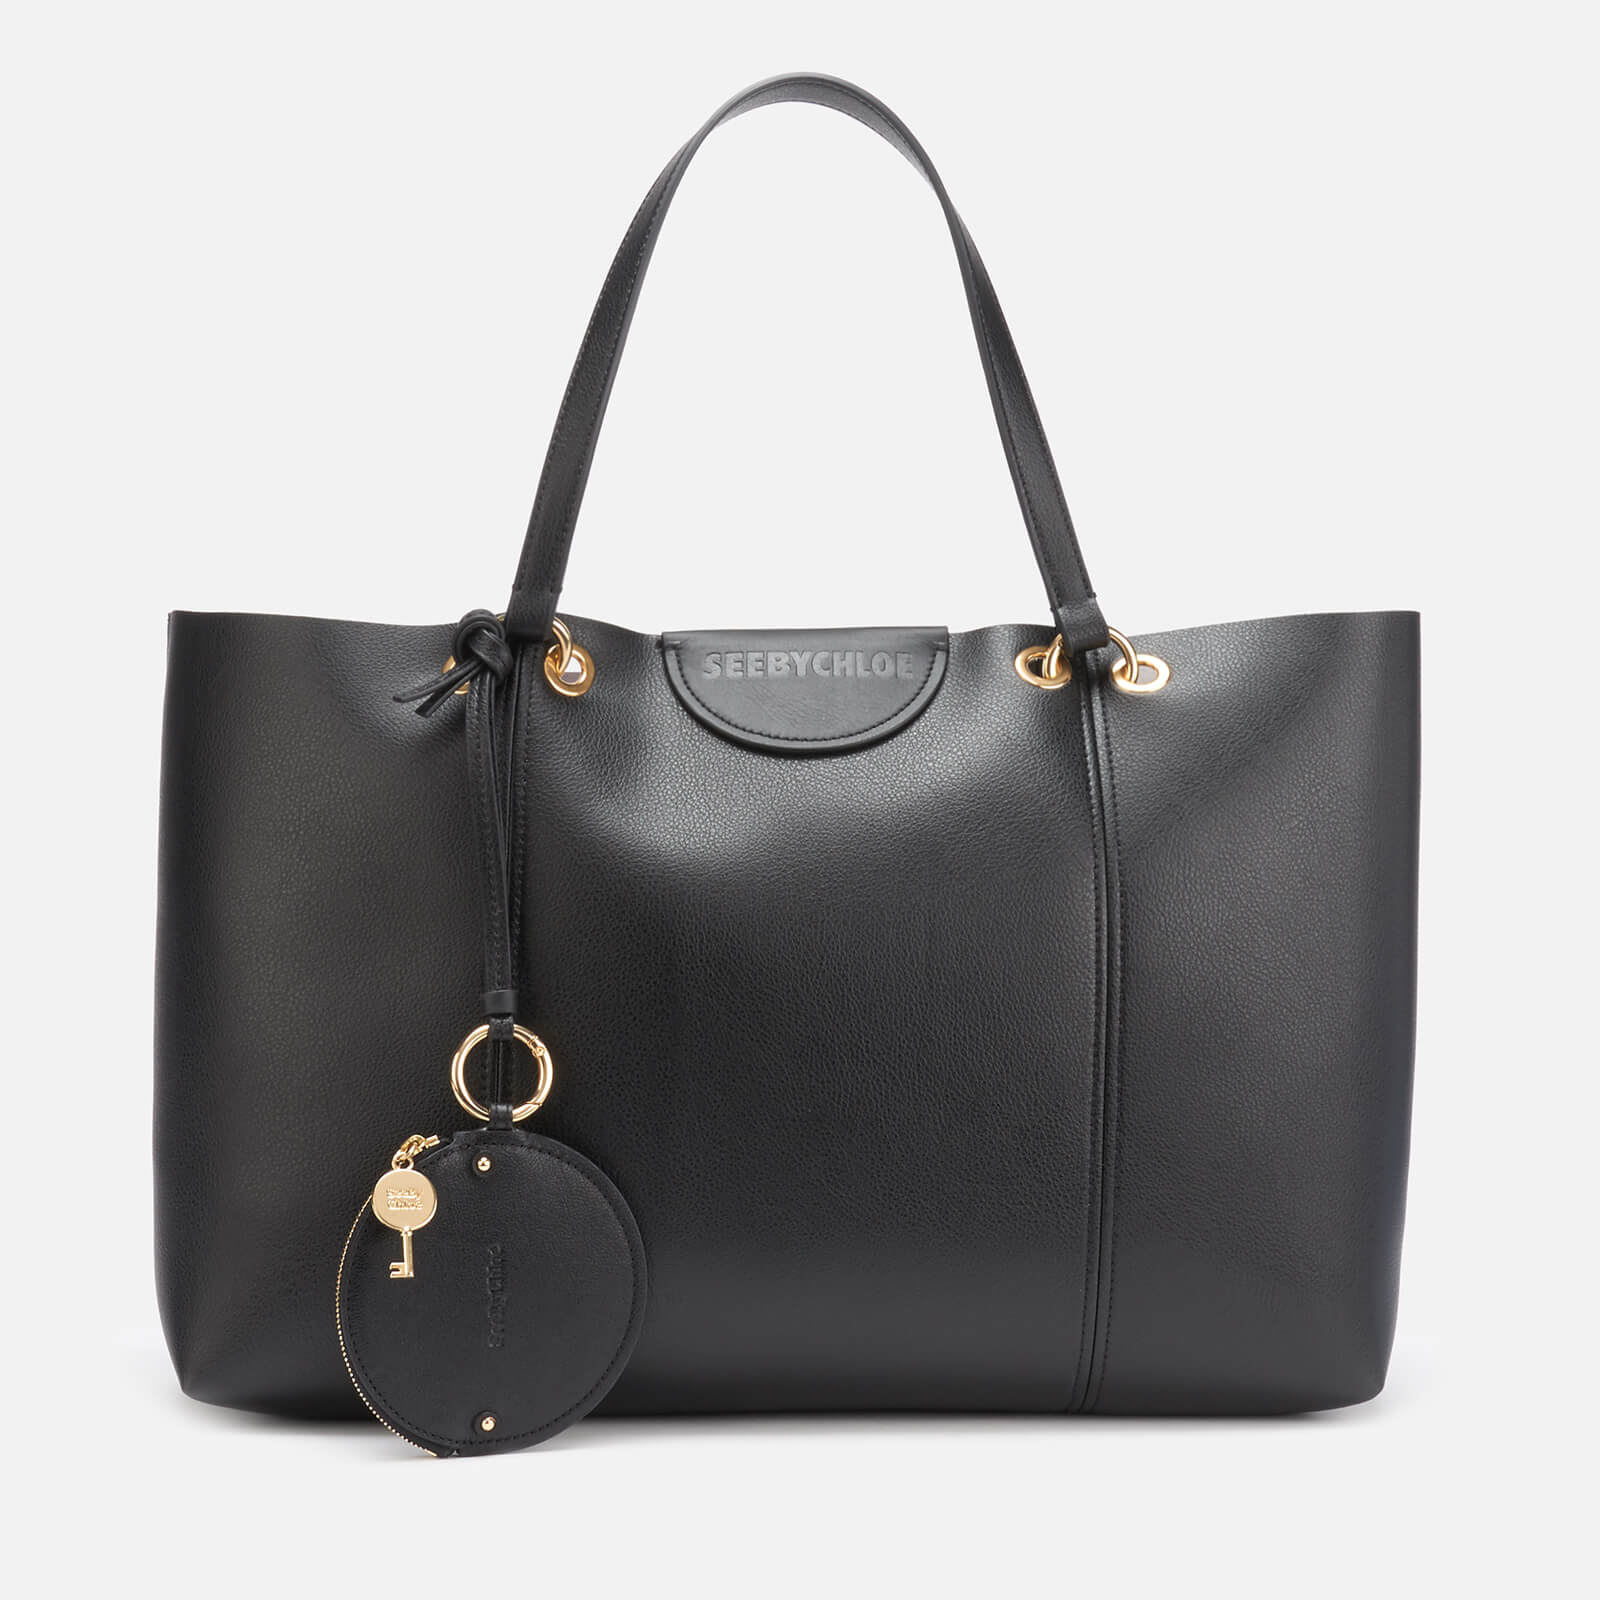 d90b352c41 See By Chloé Women's Marty Tote Bag - Black